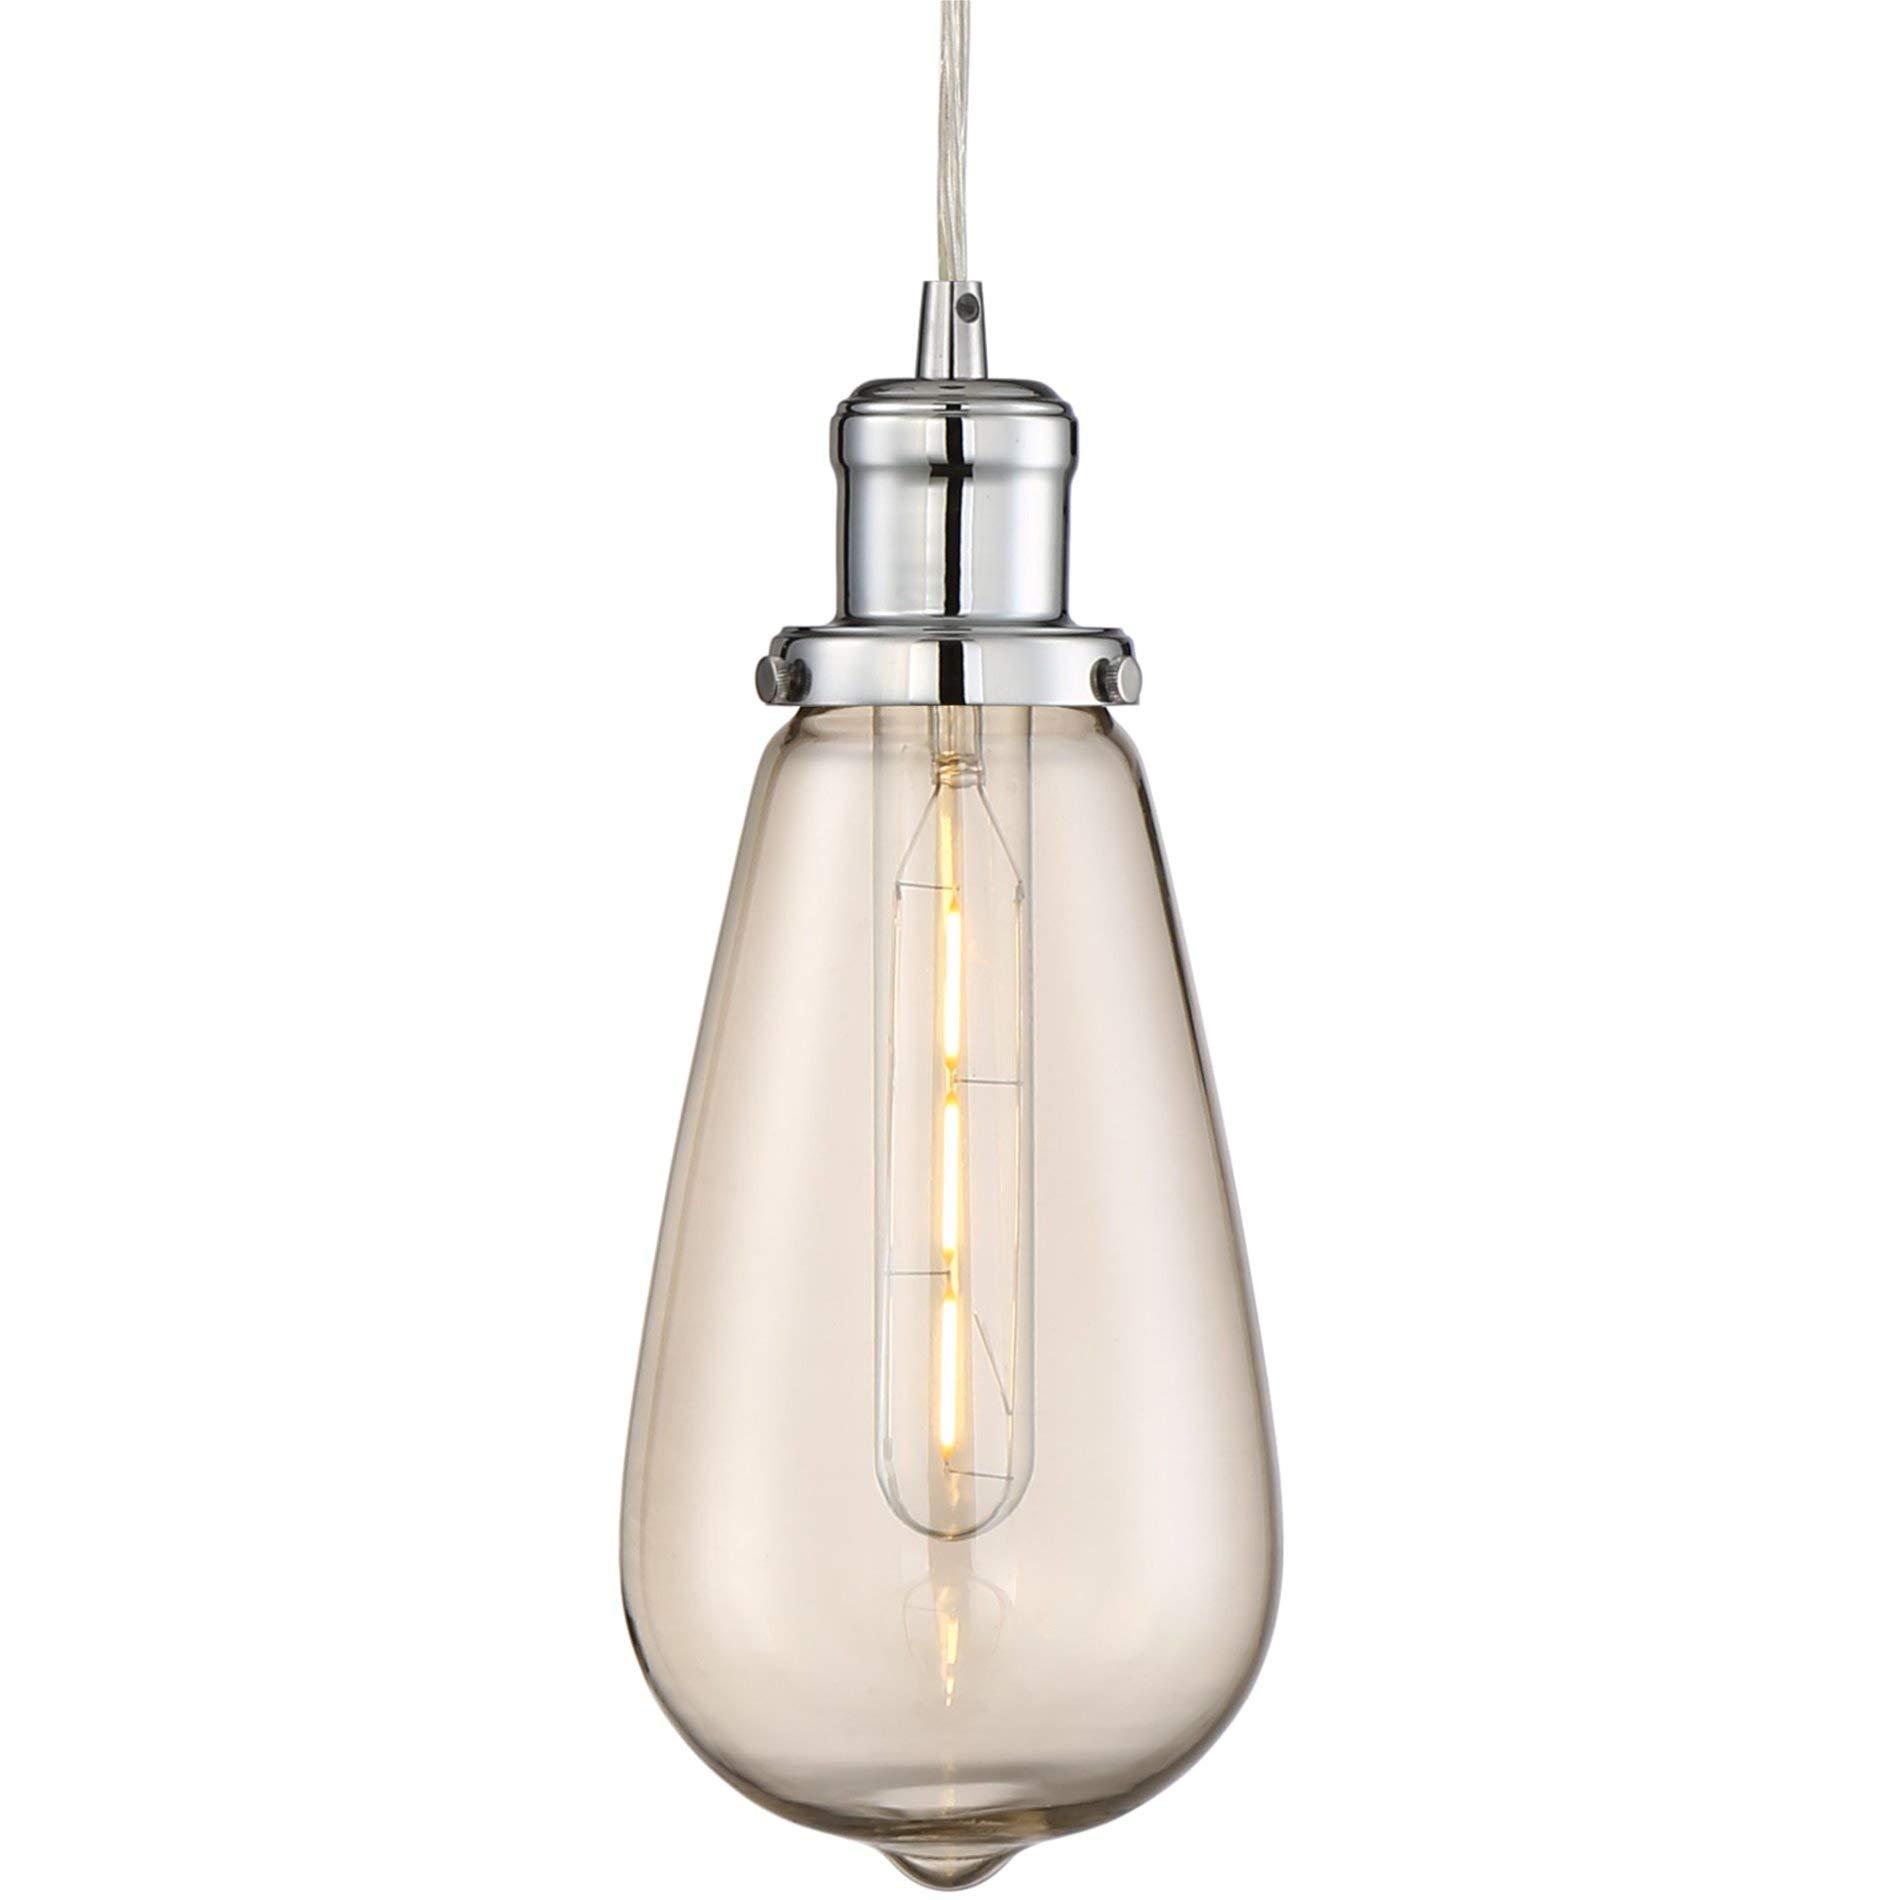 Revel Big Eddie 11.5'' Large Modern Industrial LED Pendant Light + Edison Bulb Inspired Shade, Energy Efficient/Eco-Friendly, Adjustable Wire, Chrome Finish